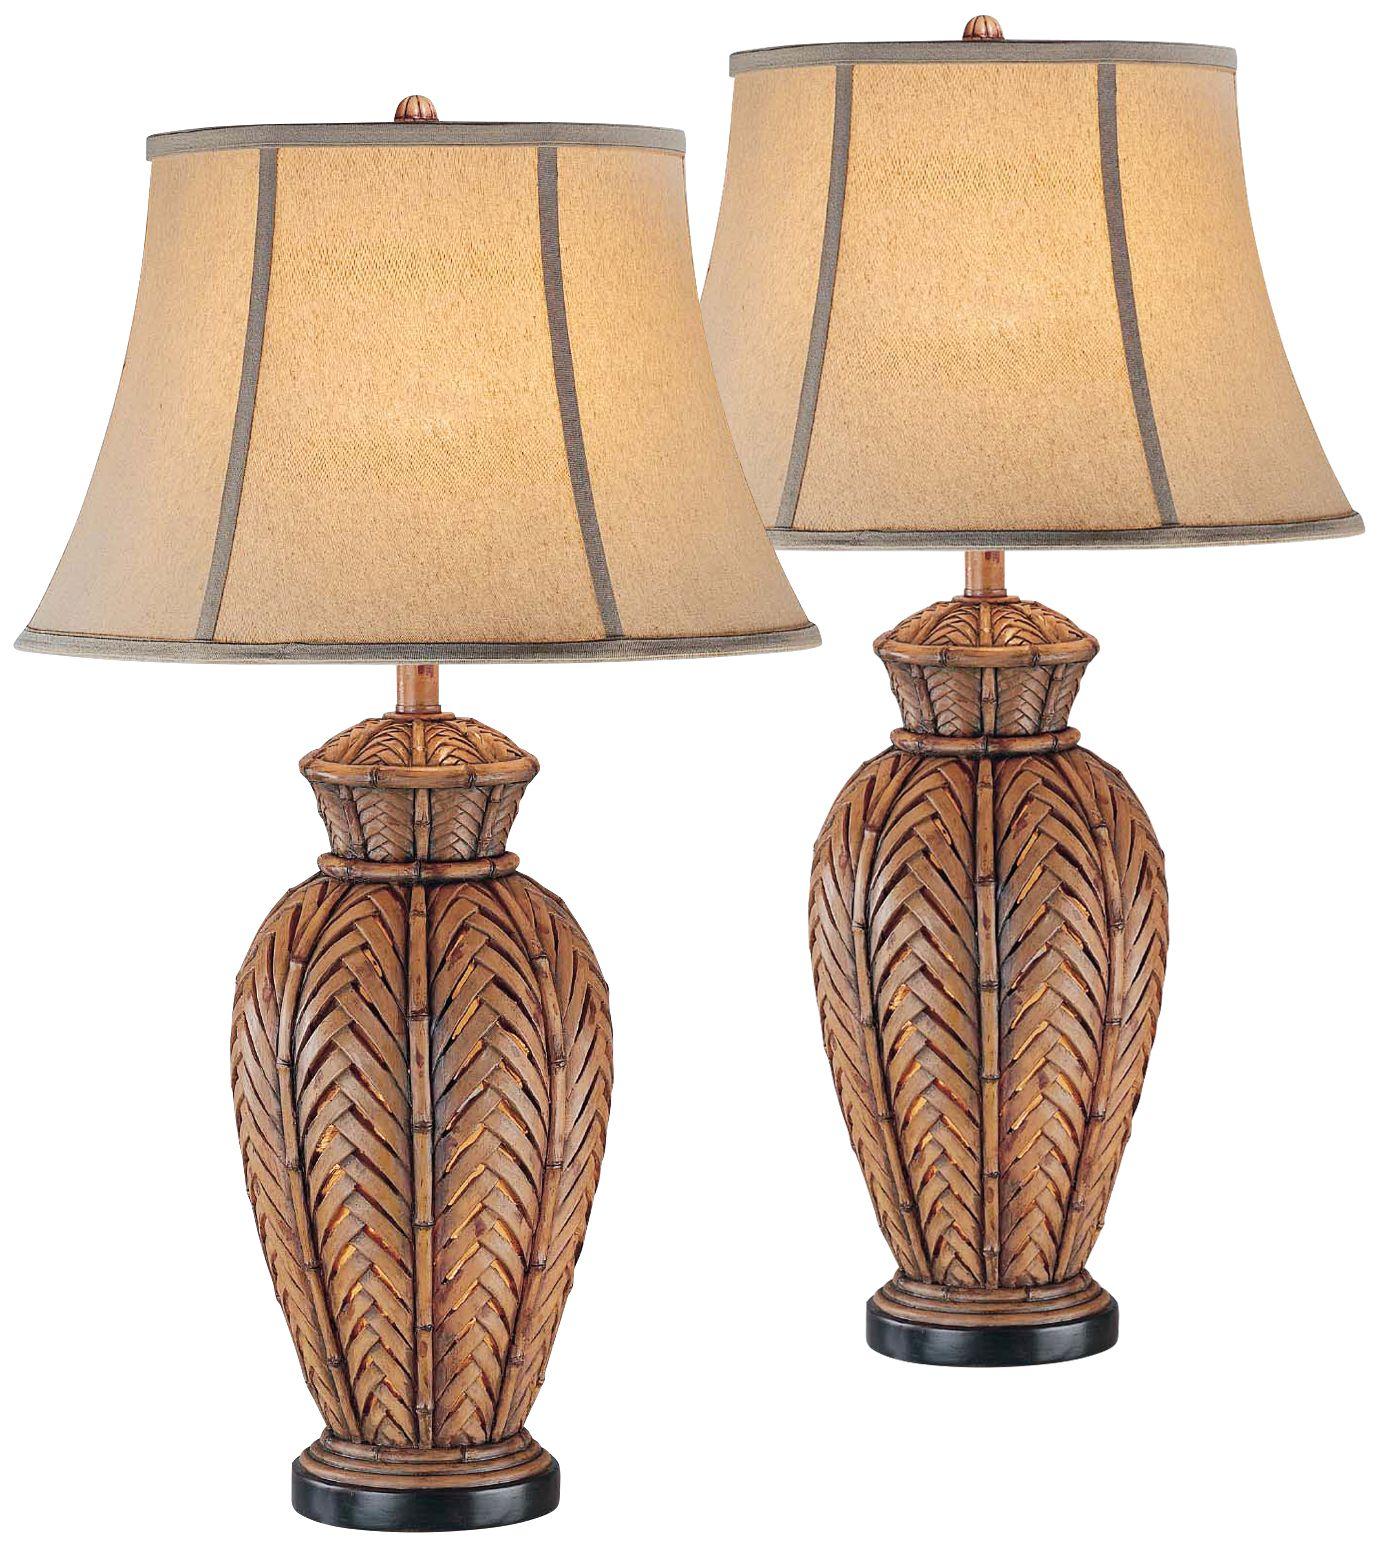 Onairo Wicker Night Light Table Lamp Set of 2